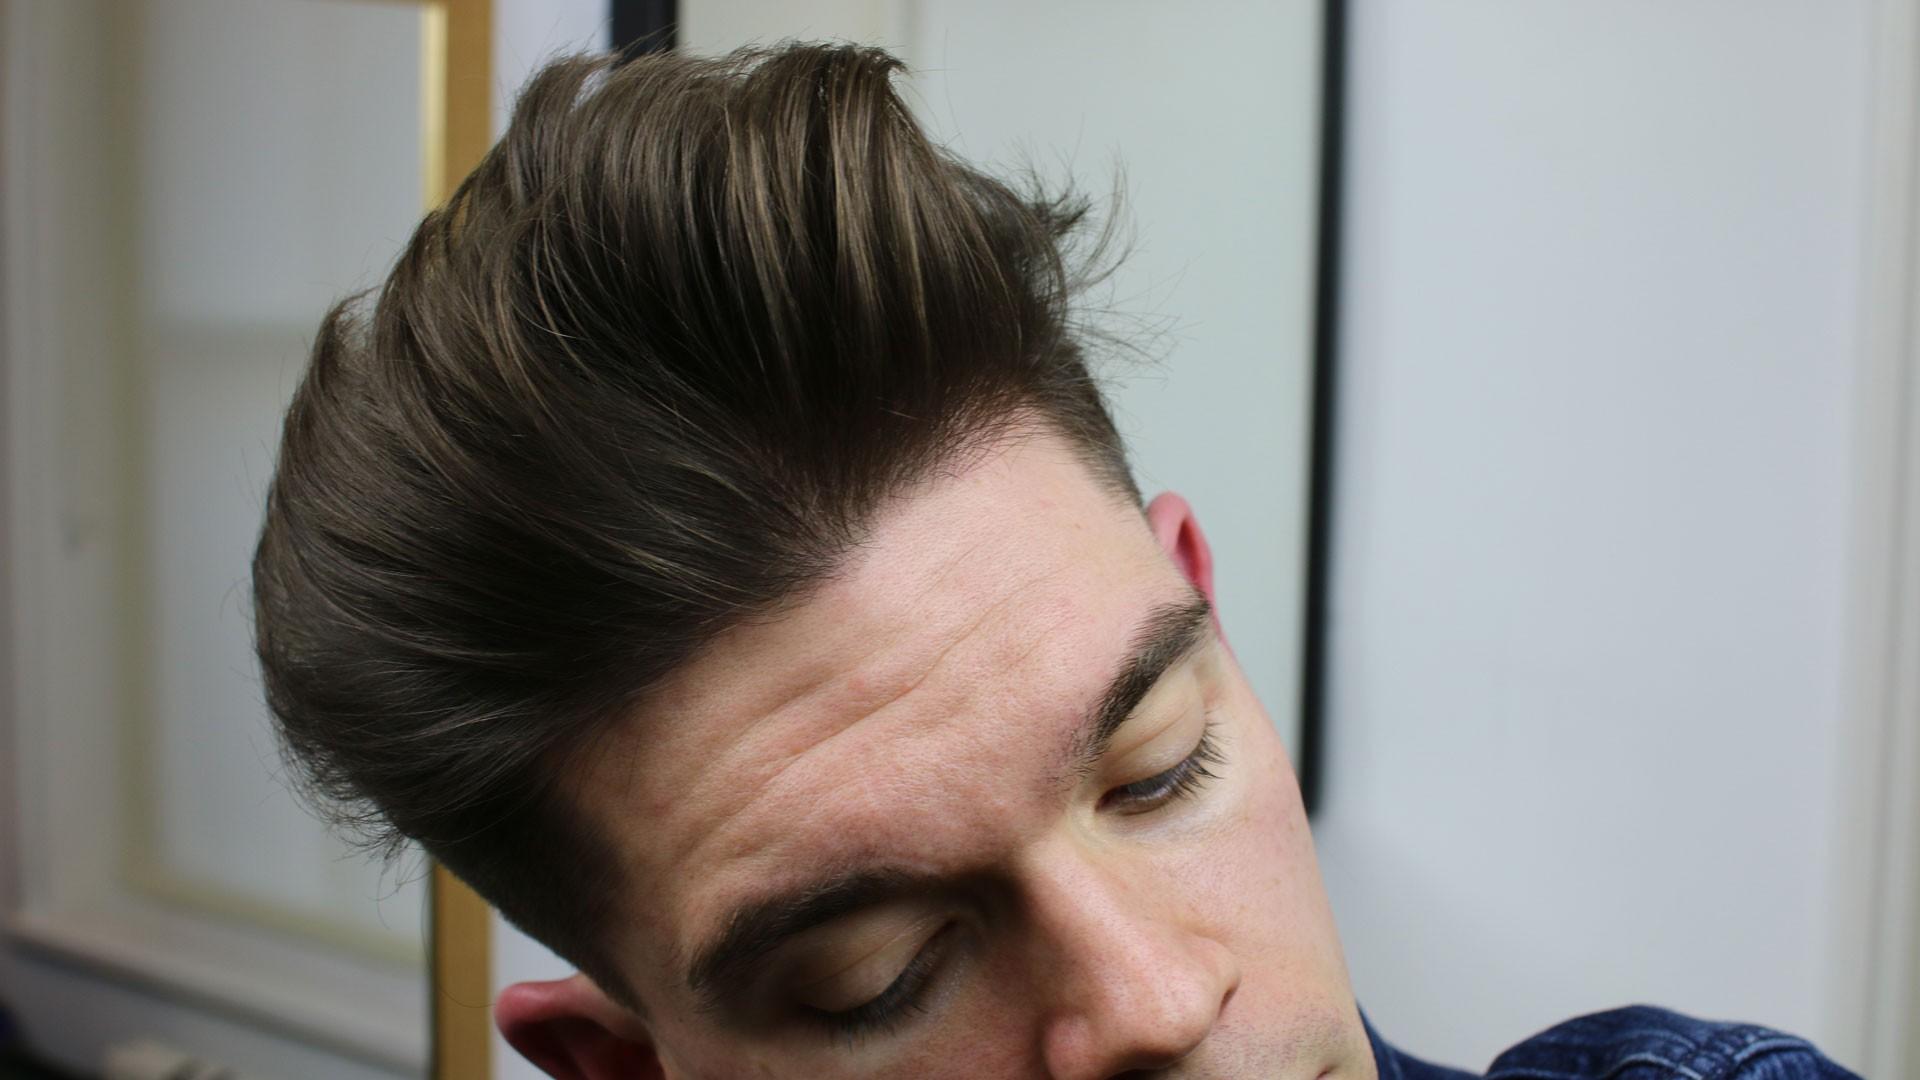 Diy Salt Spray Voluminous Textured Hair